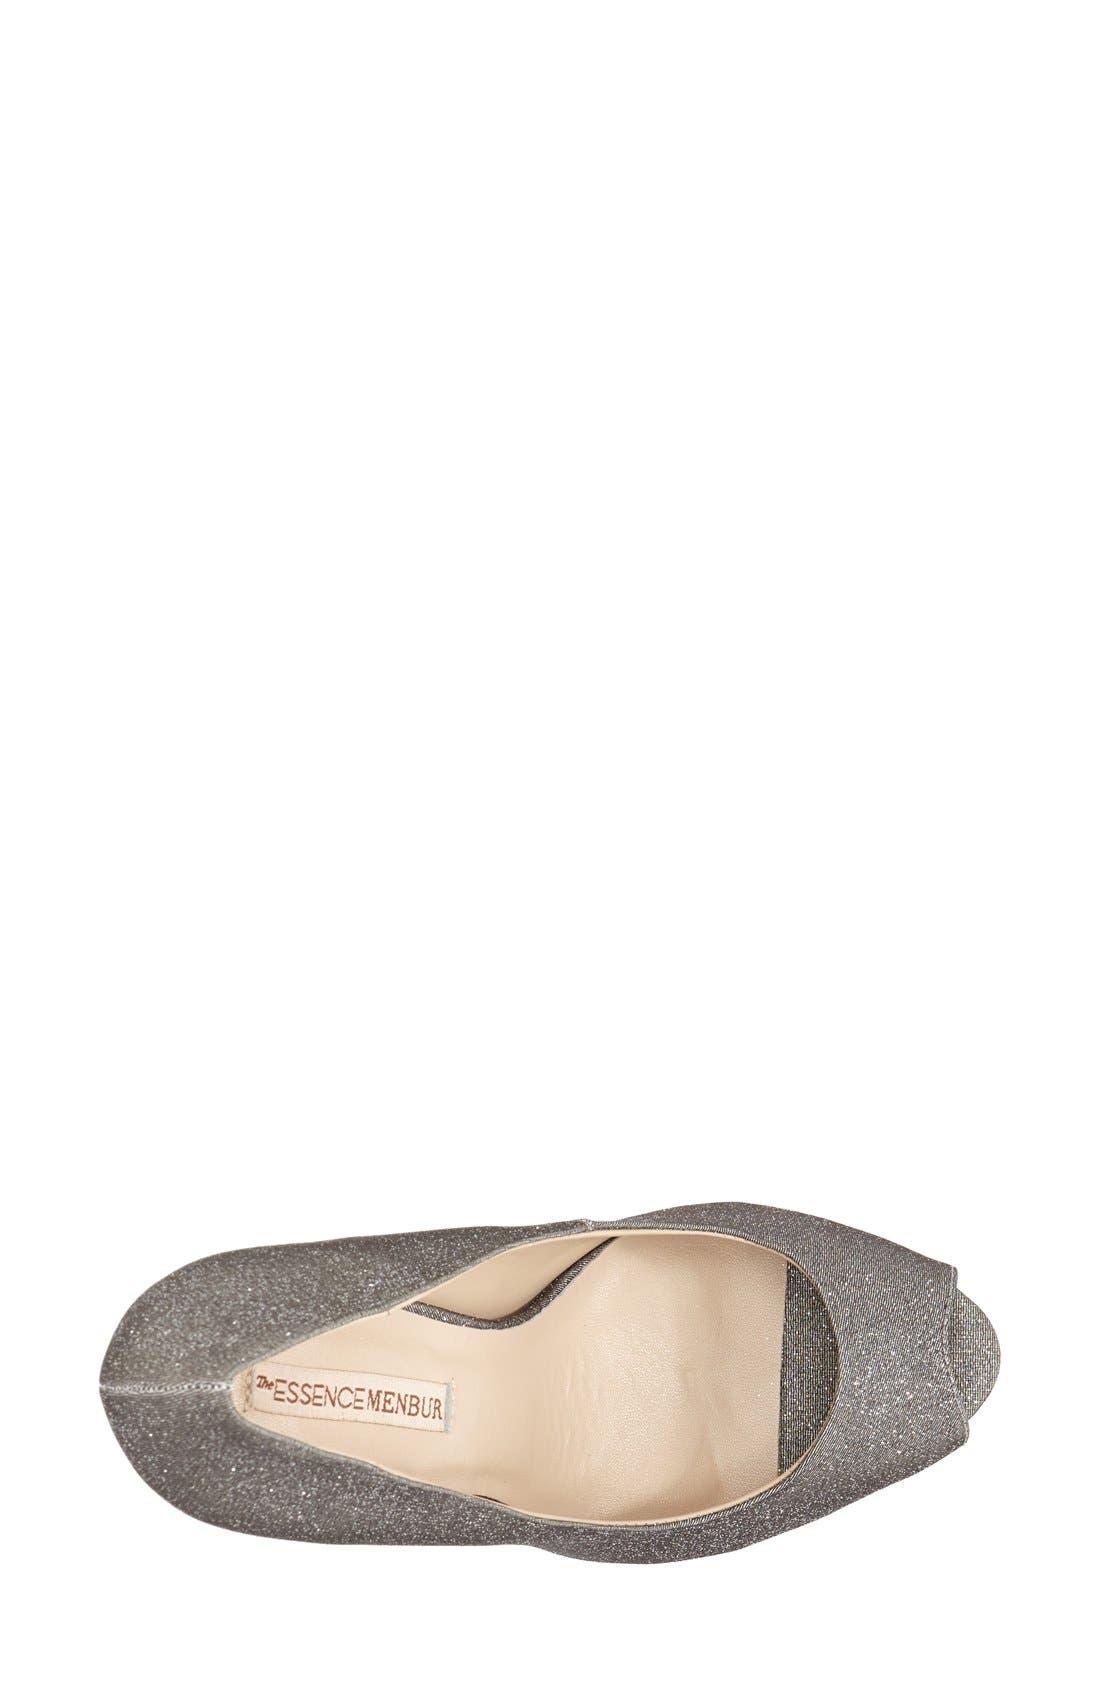 'Sotogordo' Glitter Peep Toe Platform Pump,                             Alternate thumbnail 2, color,                             021